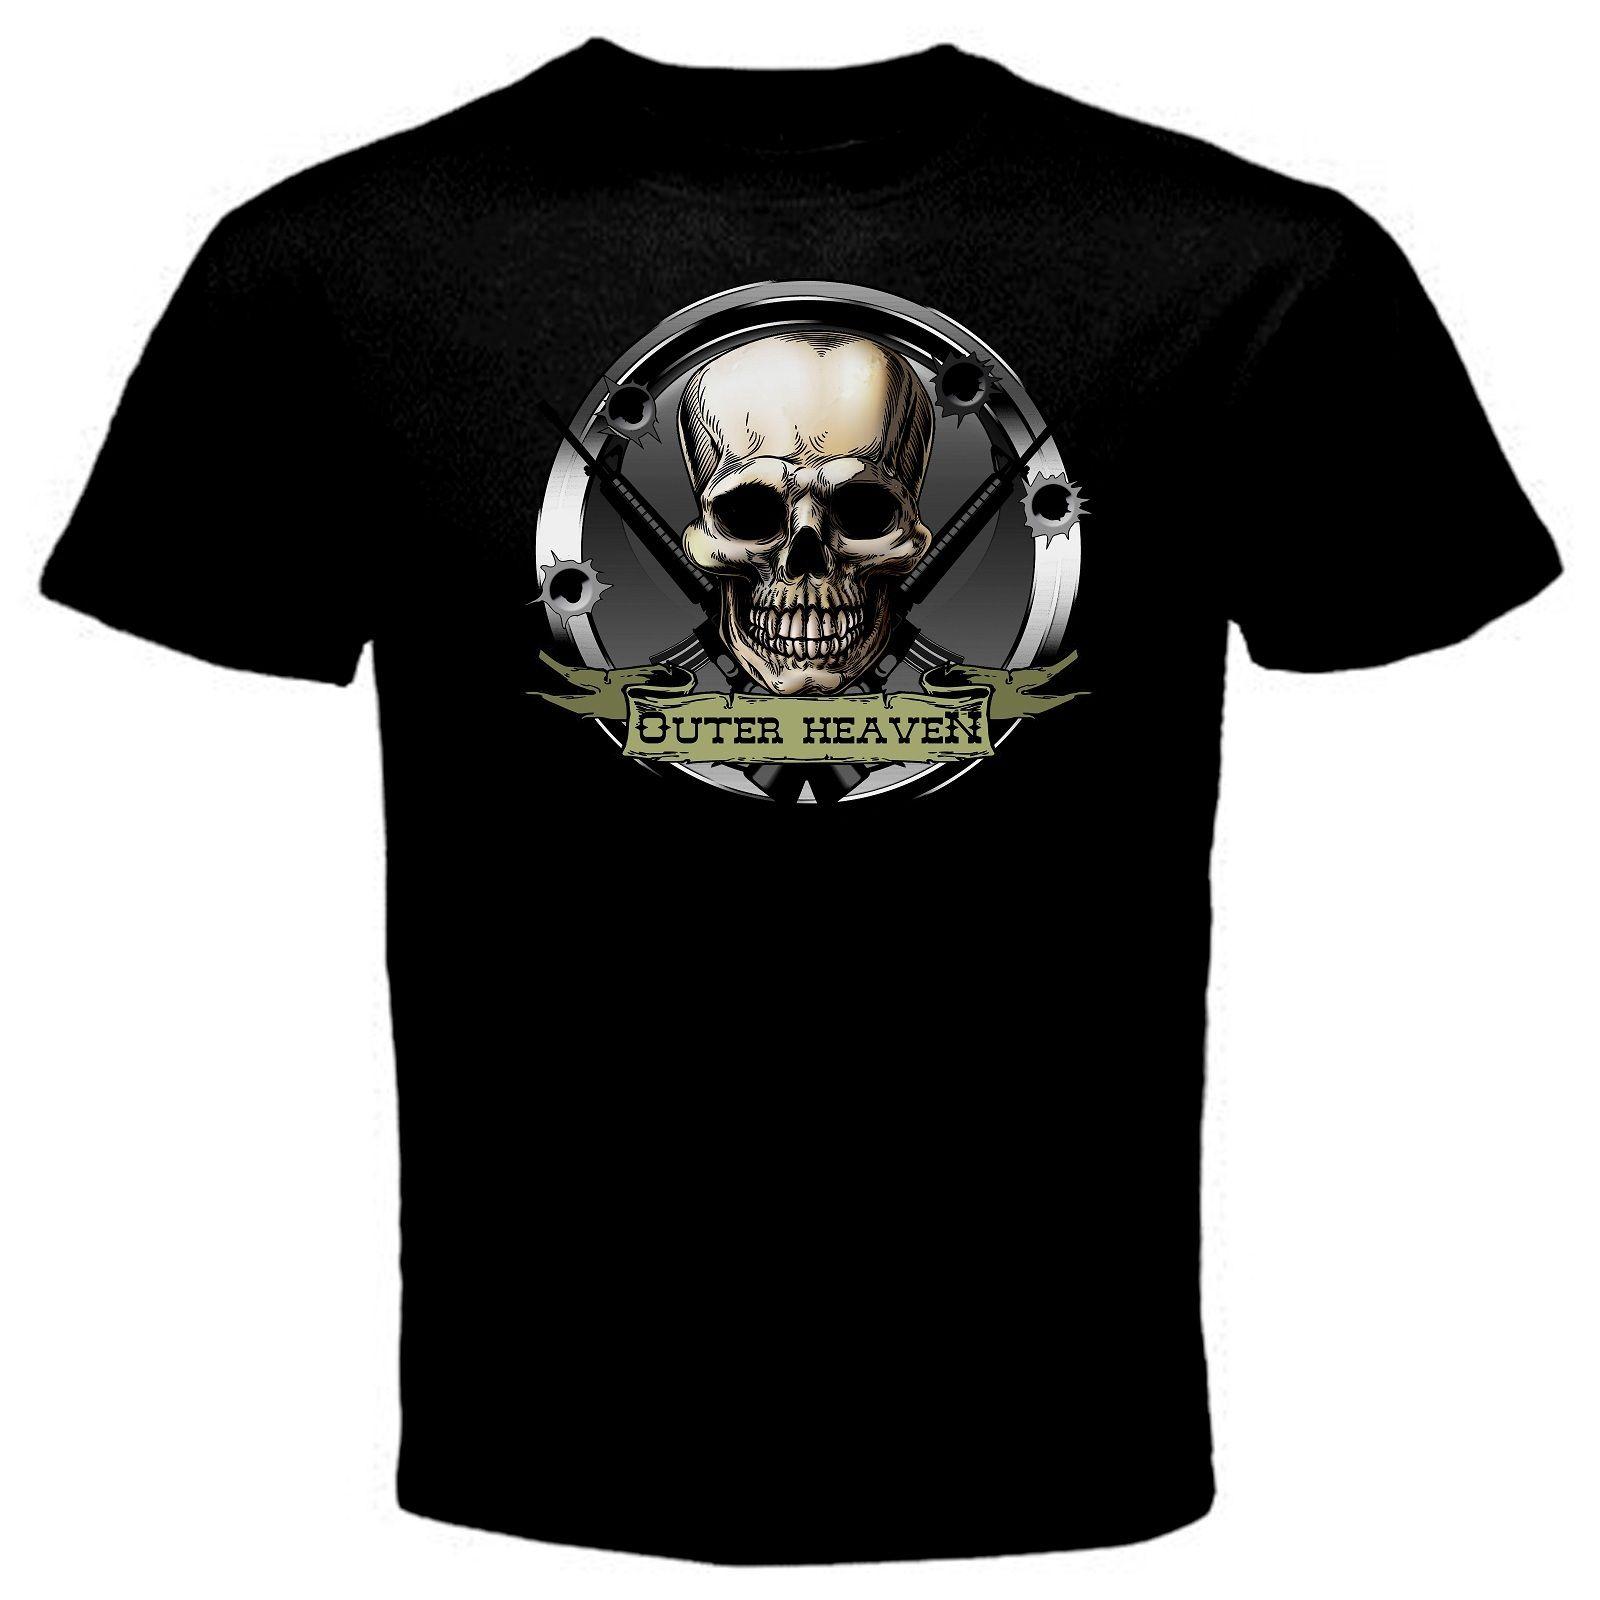 Outer Heaven Metal Gear Online Game T Shirt Black Basic Tee